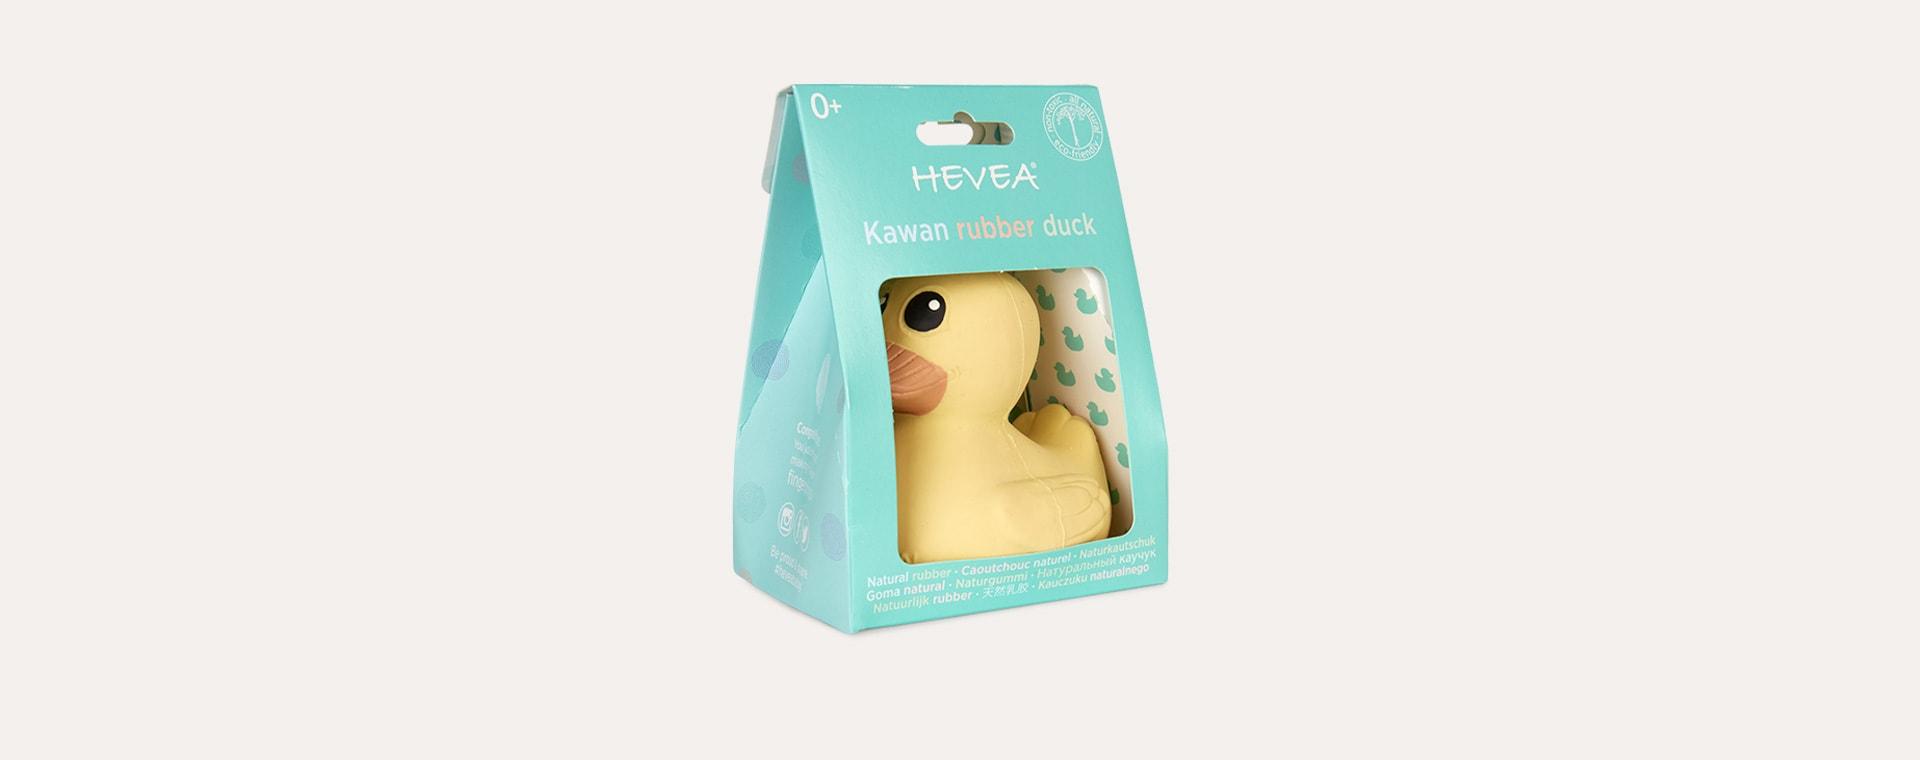 Eggnog Yellow Hevea Kawan Mini Rubber Duck